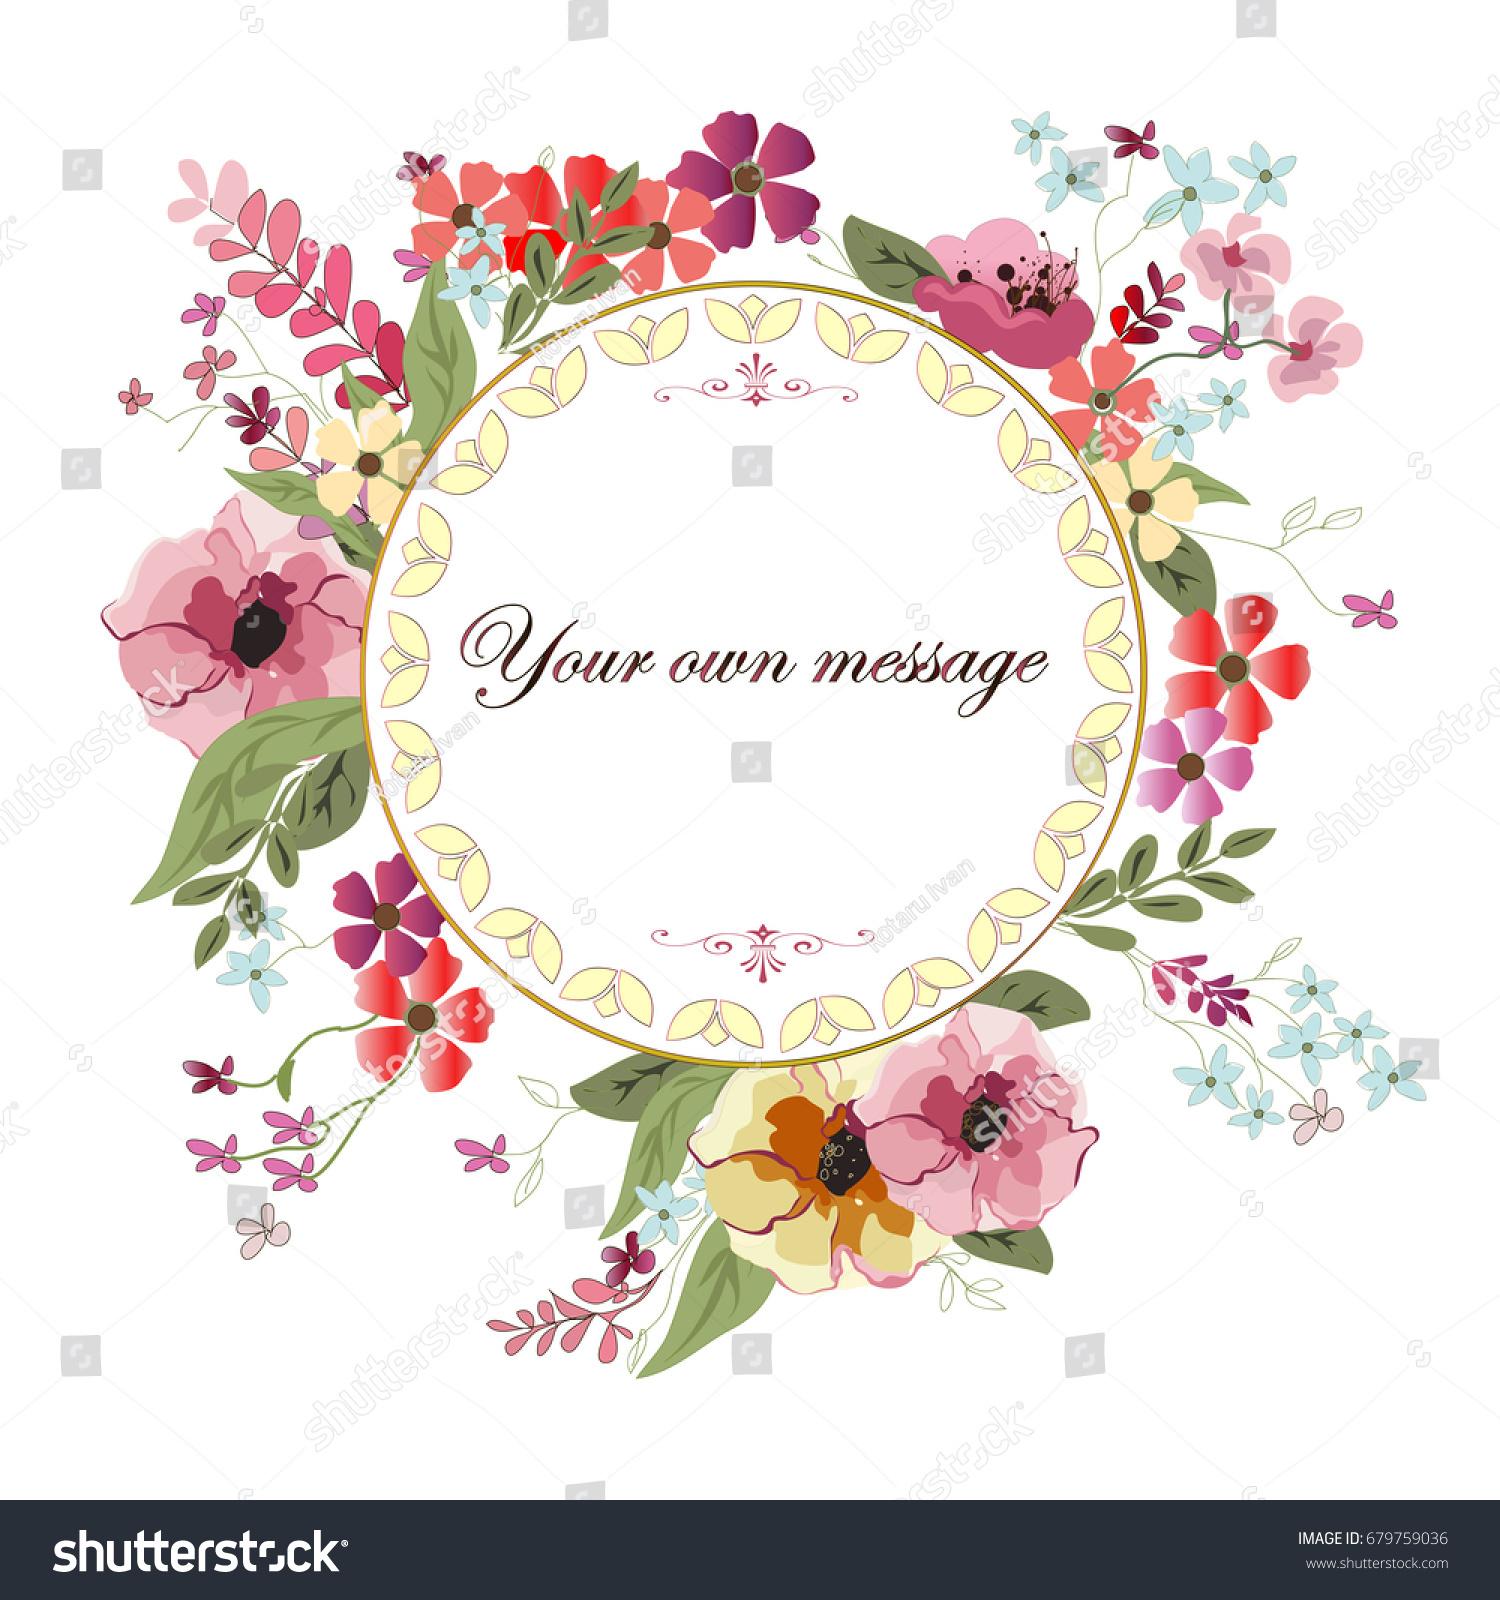 Love Romantic Greeting Invitation Card Wedding Stock Vector